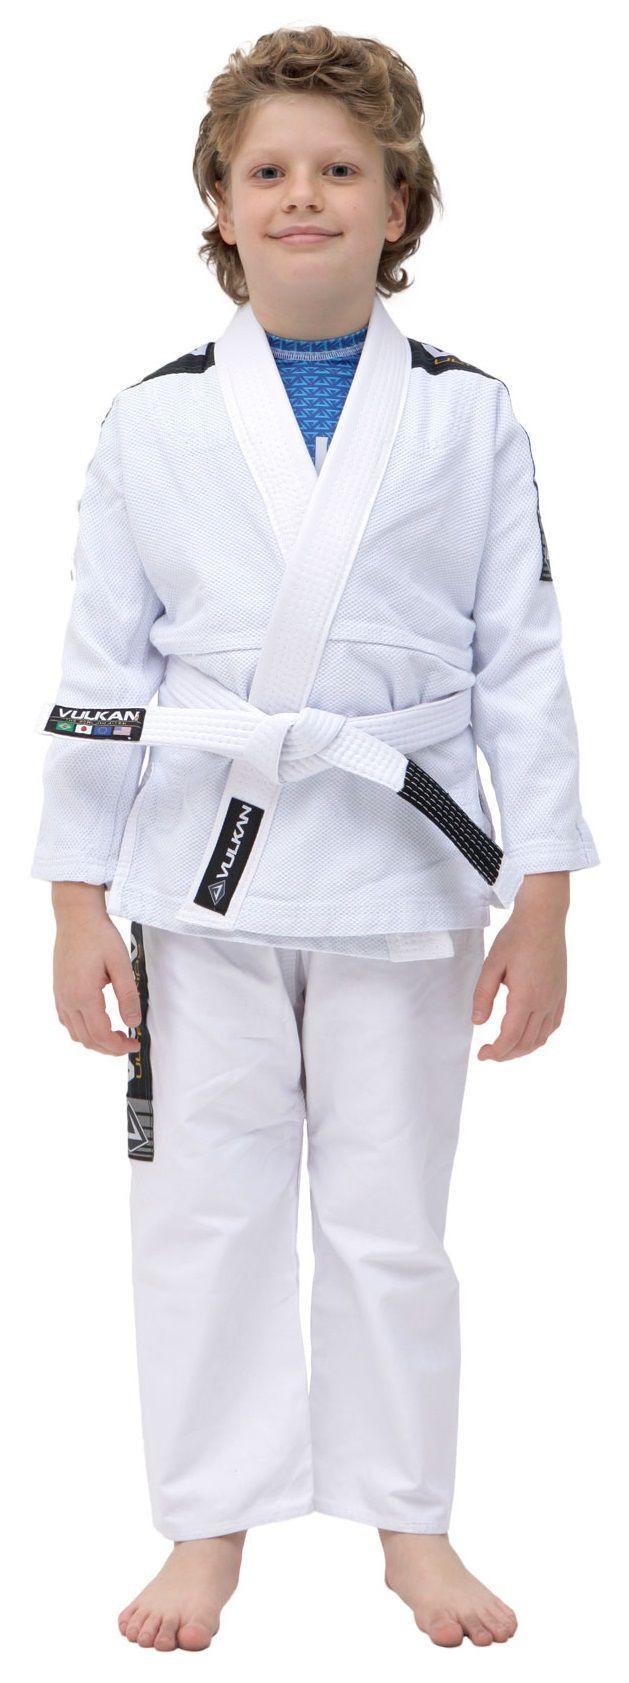 Kimono Vulkan Para Jiu-jitsu Profissional Infantil -  ULTRA LIGHT BRANCO